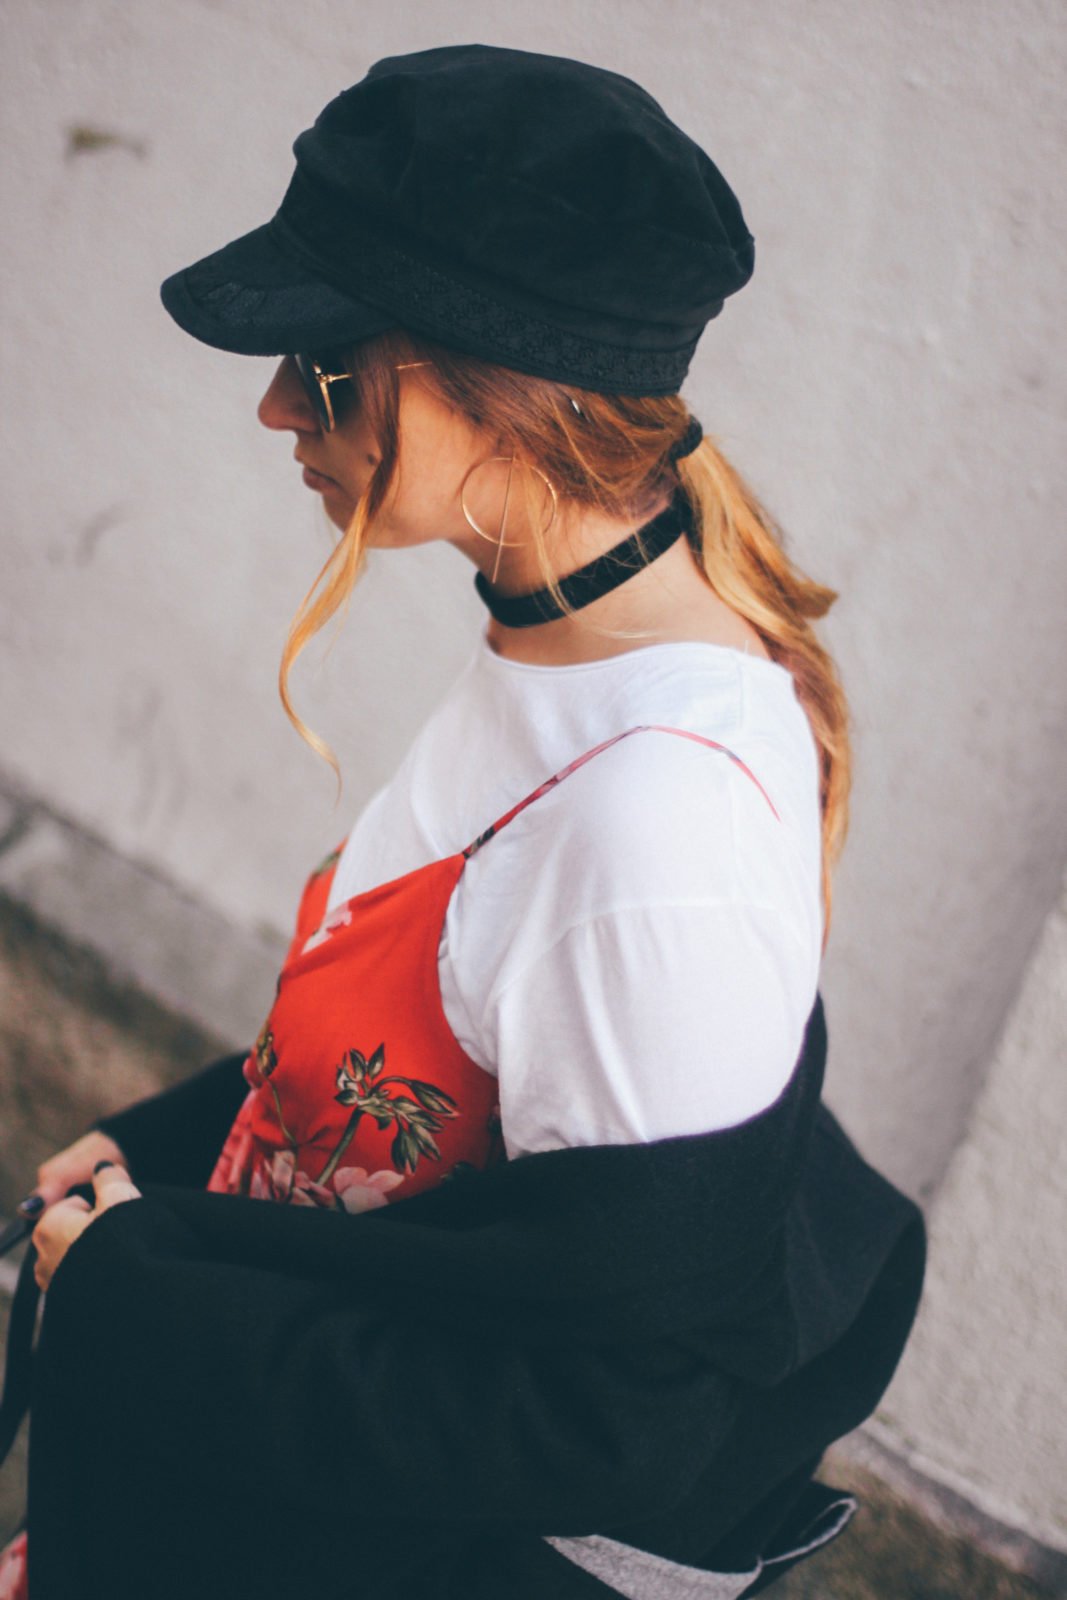 baker_boy_hat_vestido_con_camiseta_gorra_marinera_botines_hebillas_fall_2016_trends_street_style_outfits_donkeycool-29